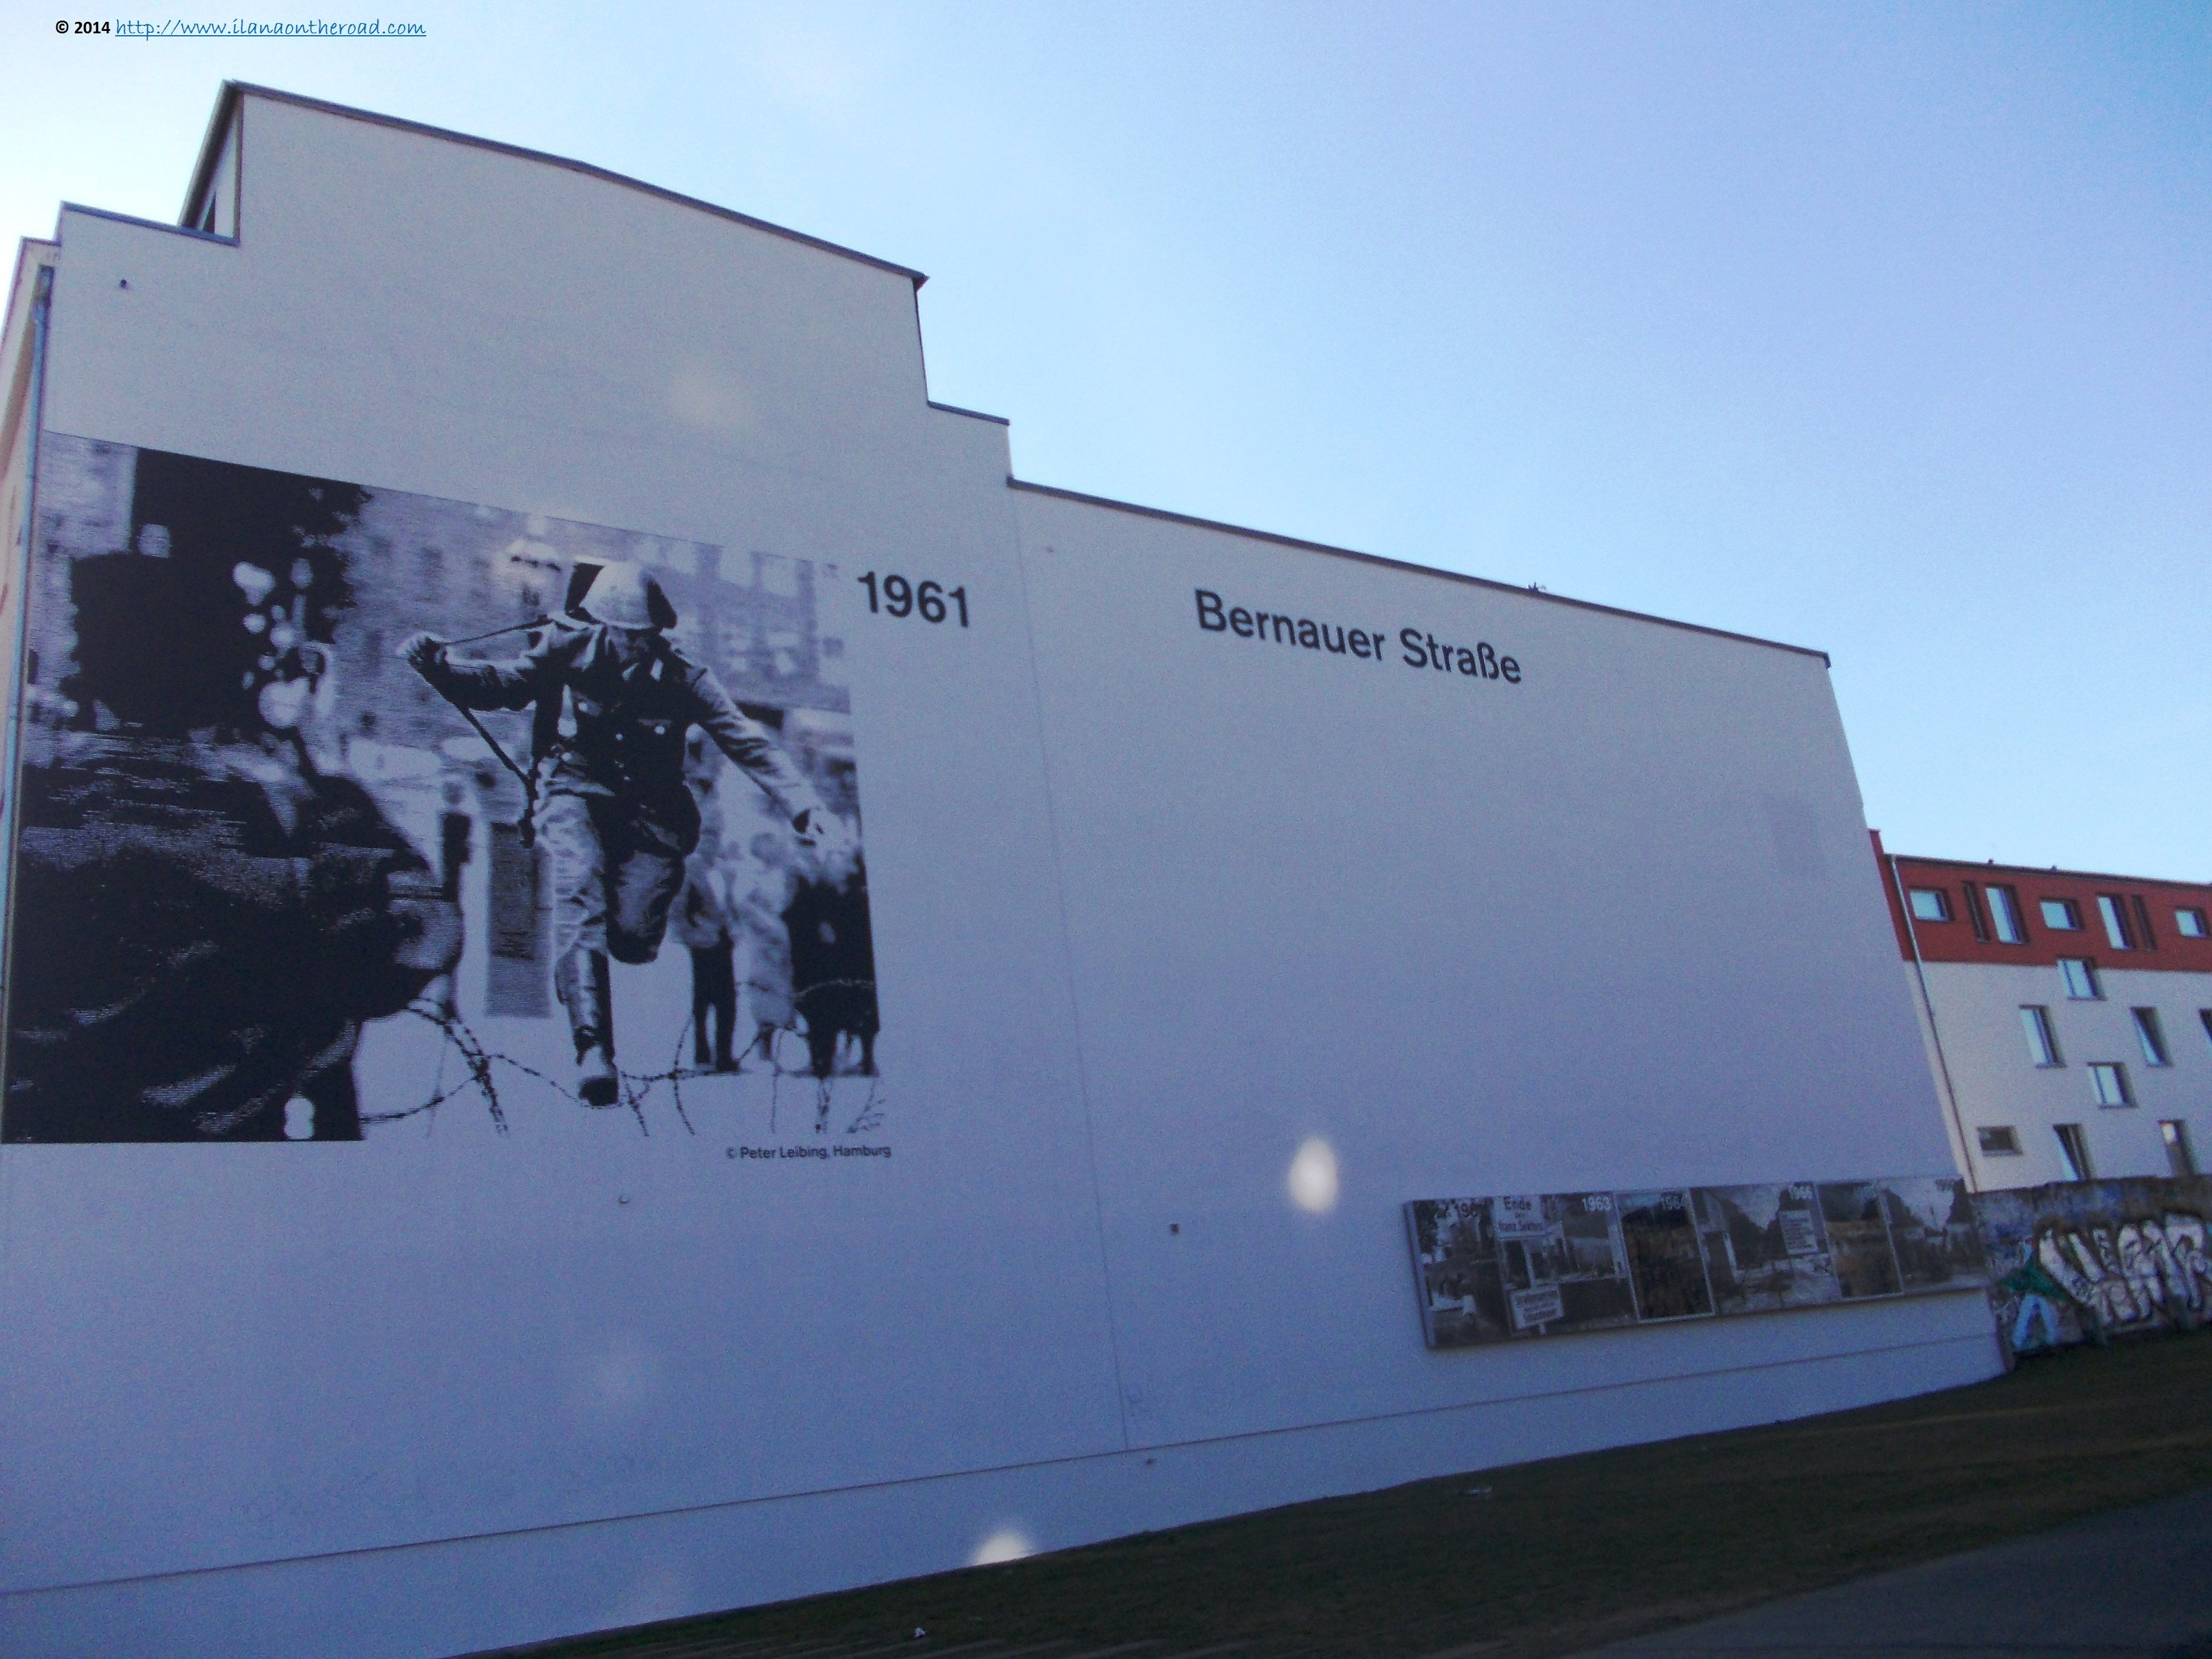 Memories of the wall, on Bernauerstrasse